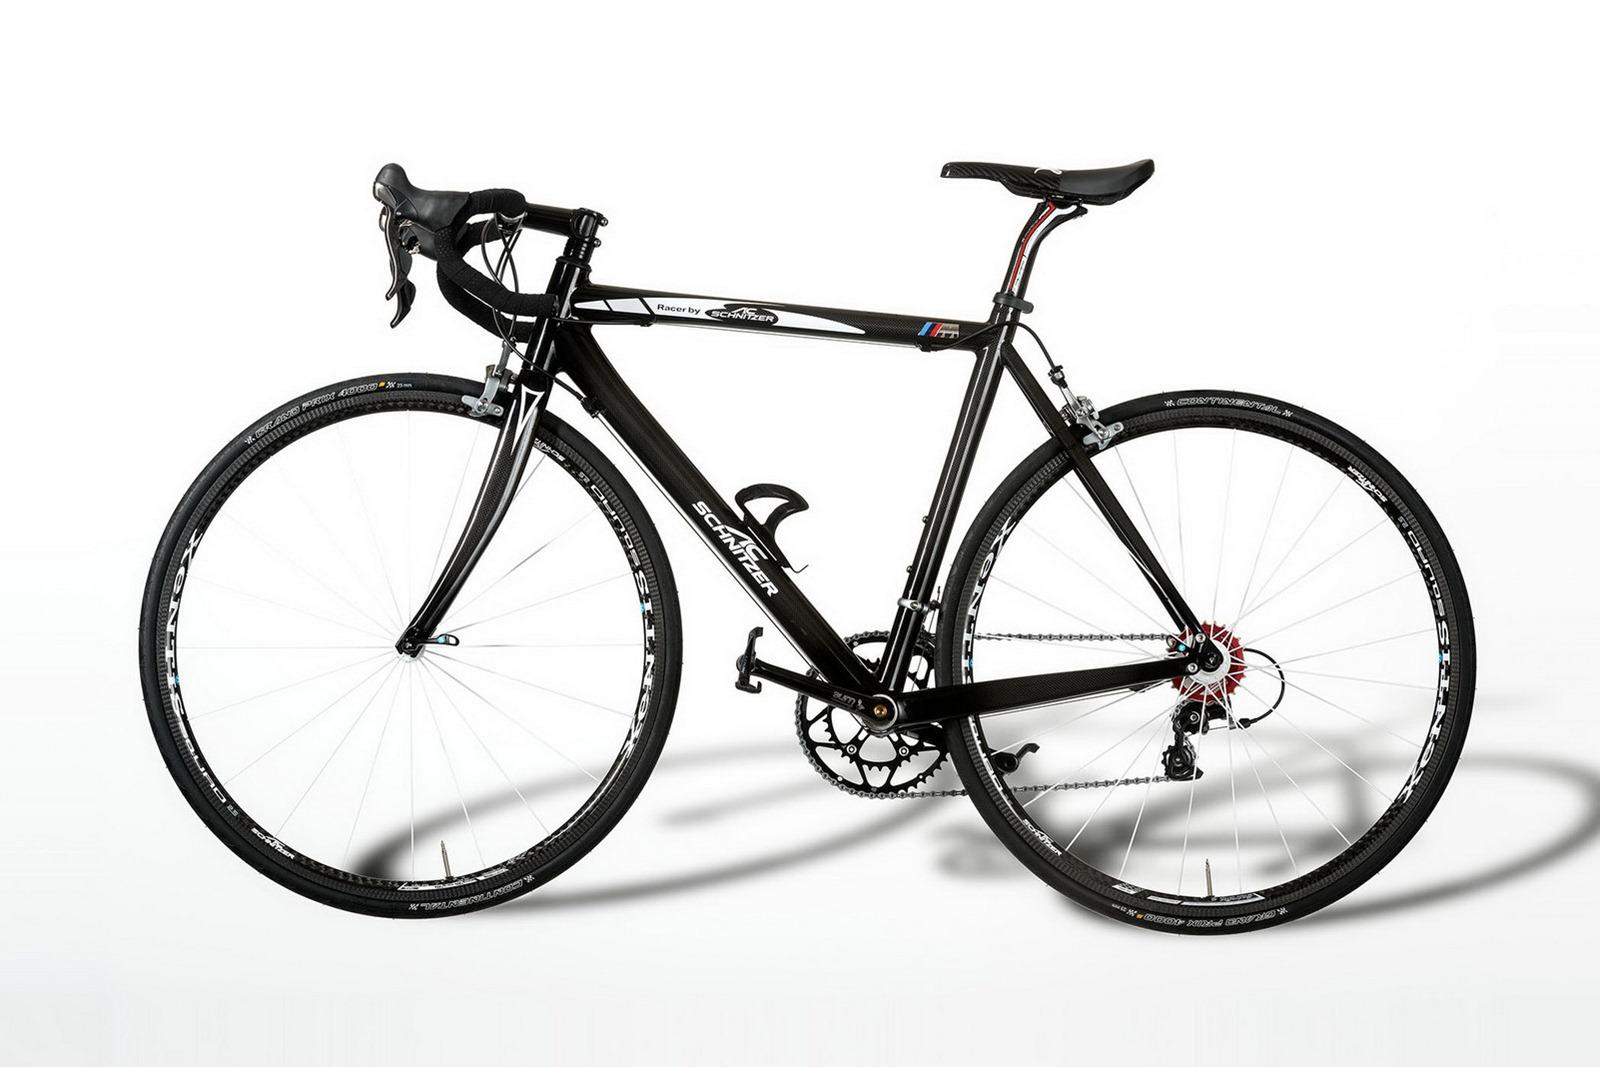 AC Schnitzer BMW M Carbon bike